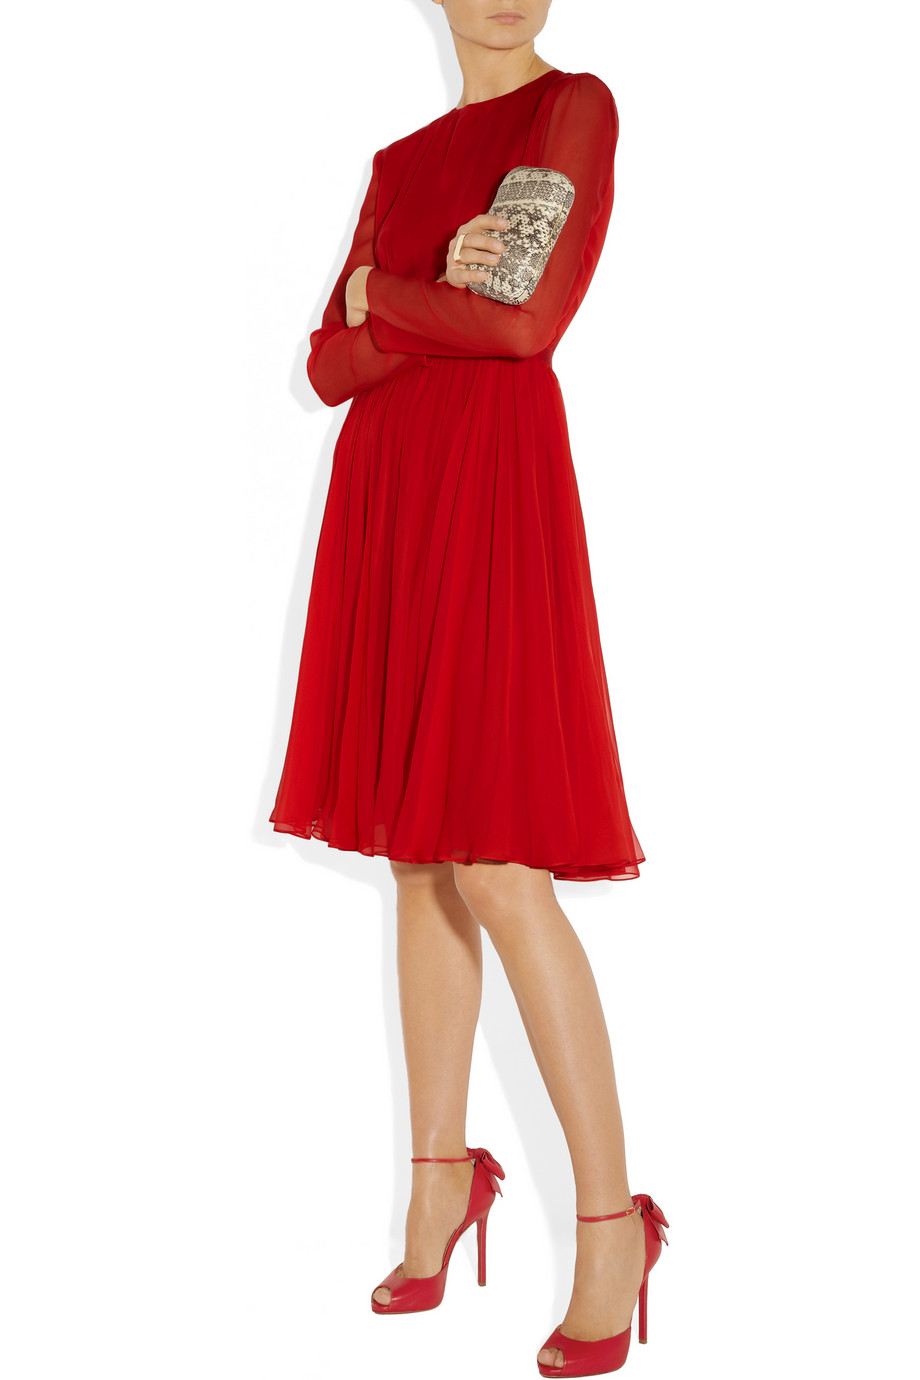 christian louboutin men sneakers - Shoeniverse: CHRISTIAN LOUBOUTIN Red Noeud 120 Bow Embellished ...